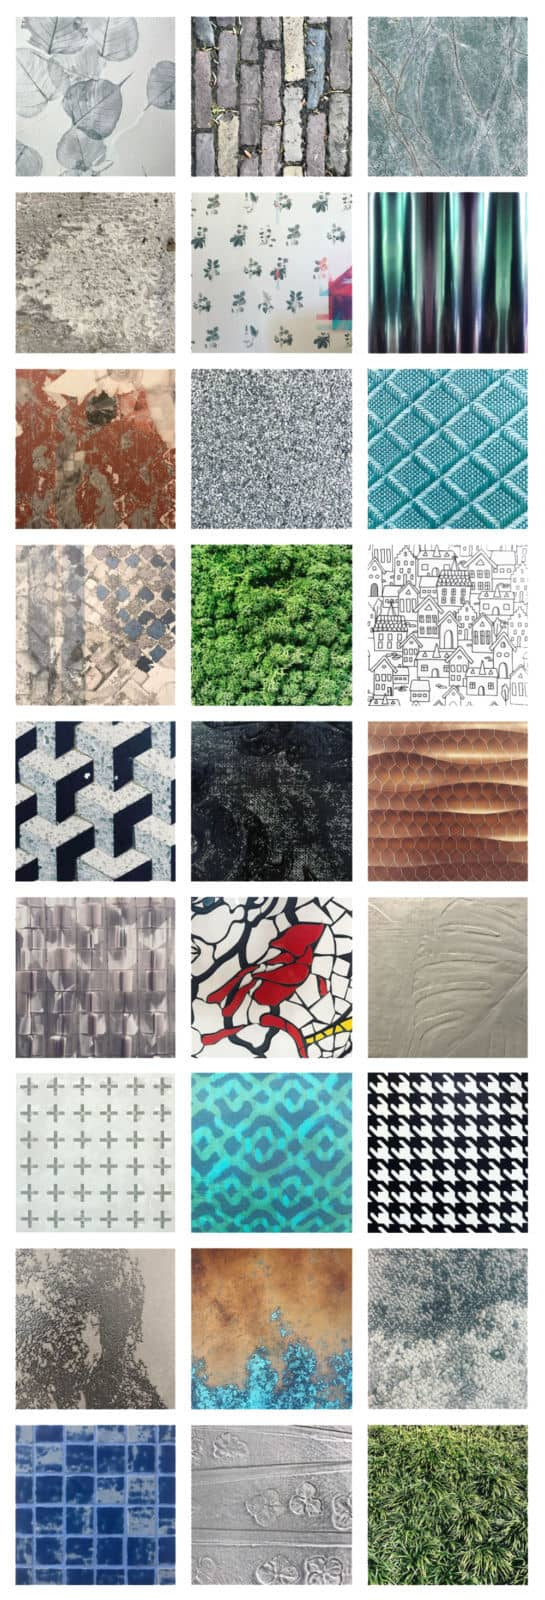 Fuorisalone 2017 in texture allyoucantexture